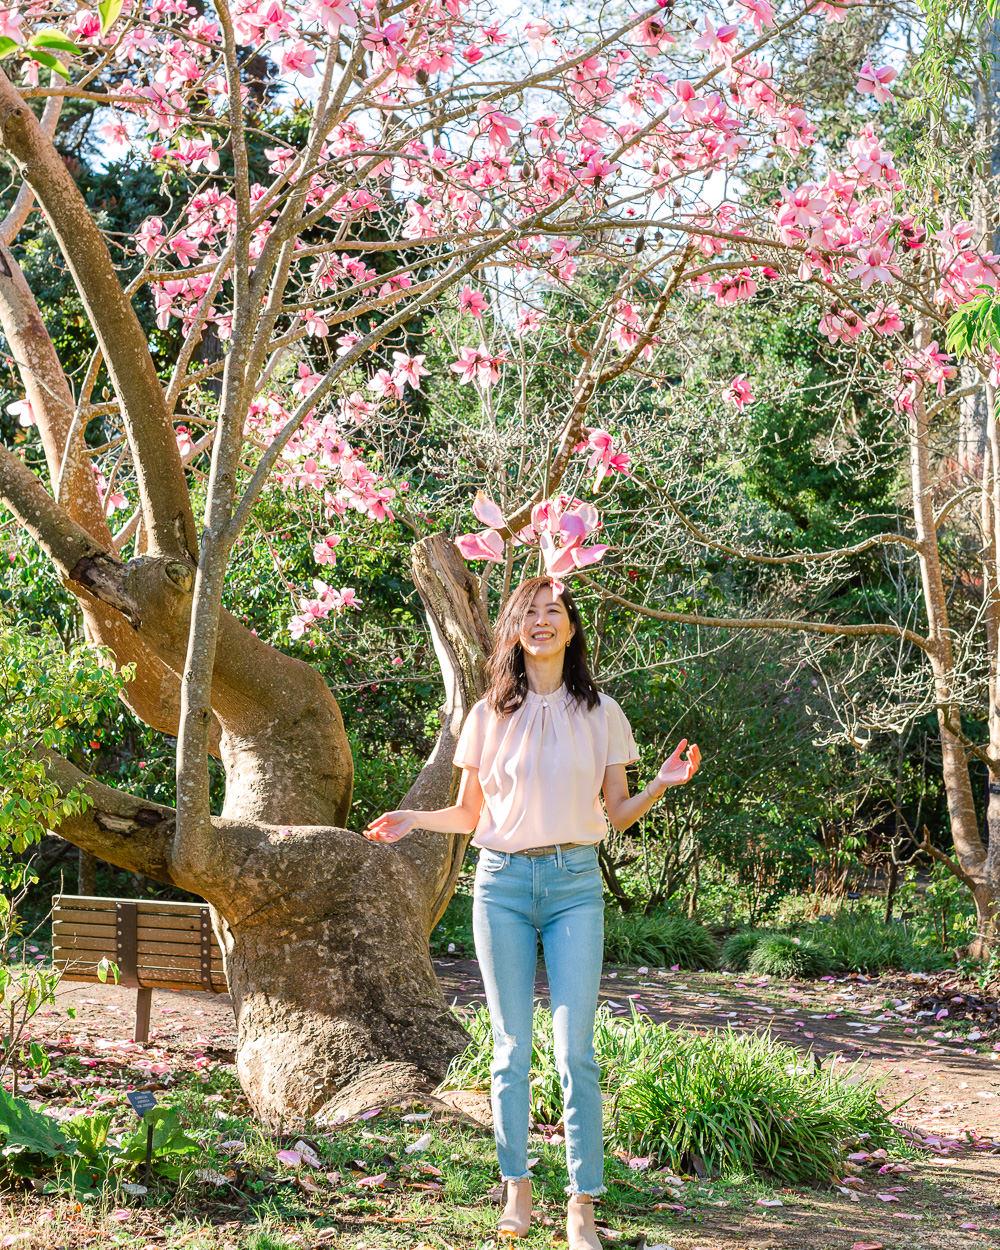 Magnificent Magnolias at the San Francisco Botanical Garden